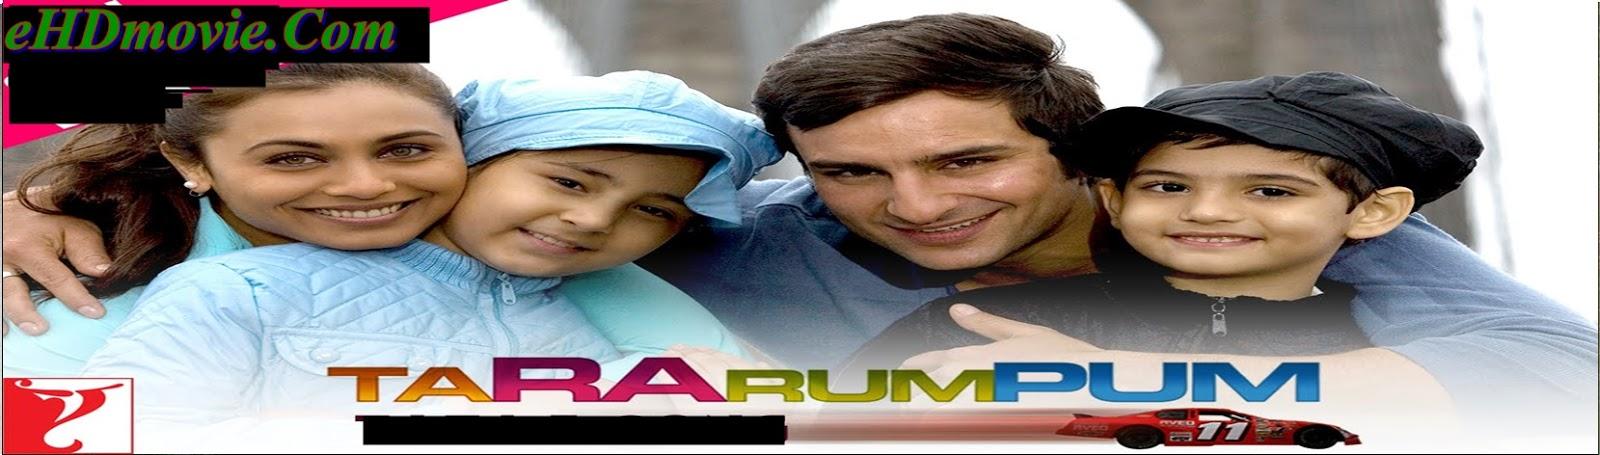 Ta Ra Rum Pum 2007 Full Movie Hindi 720p - 480p ORG BRRip 650MB - 1.4GB ESubs Free Download